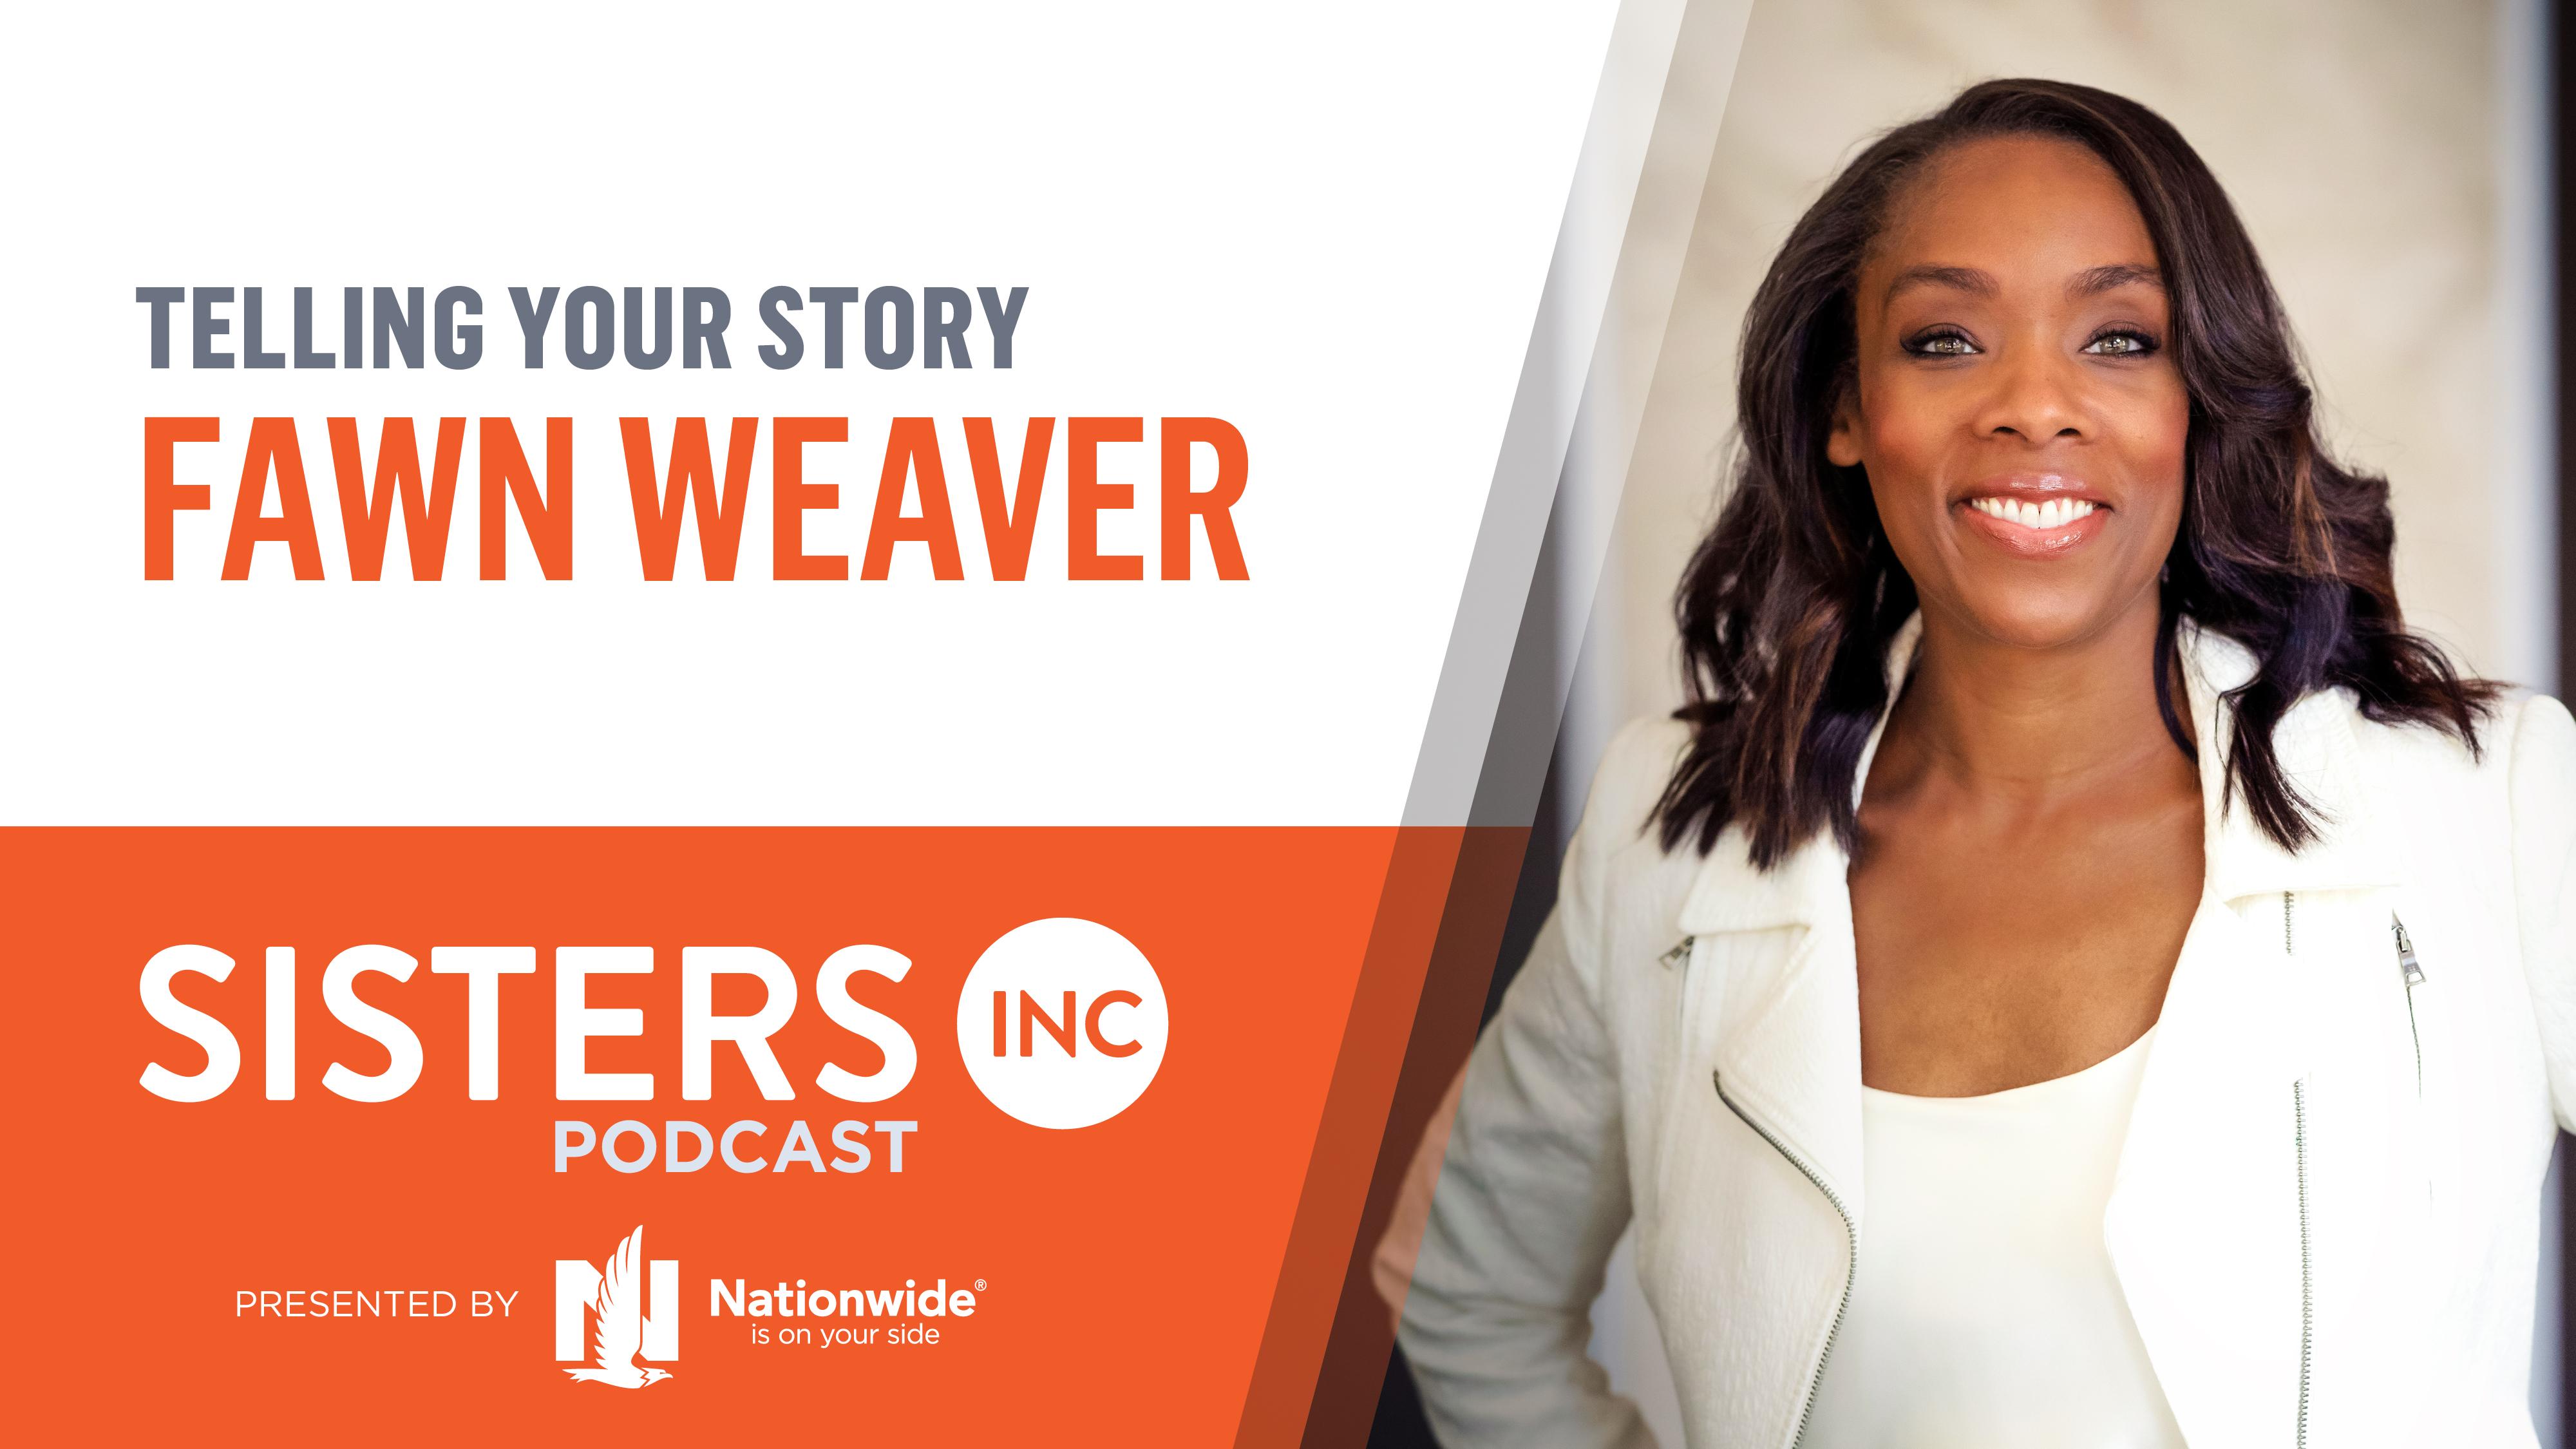 SistersInc. podcast Episode 4